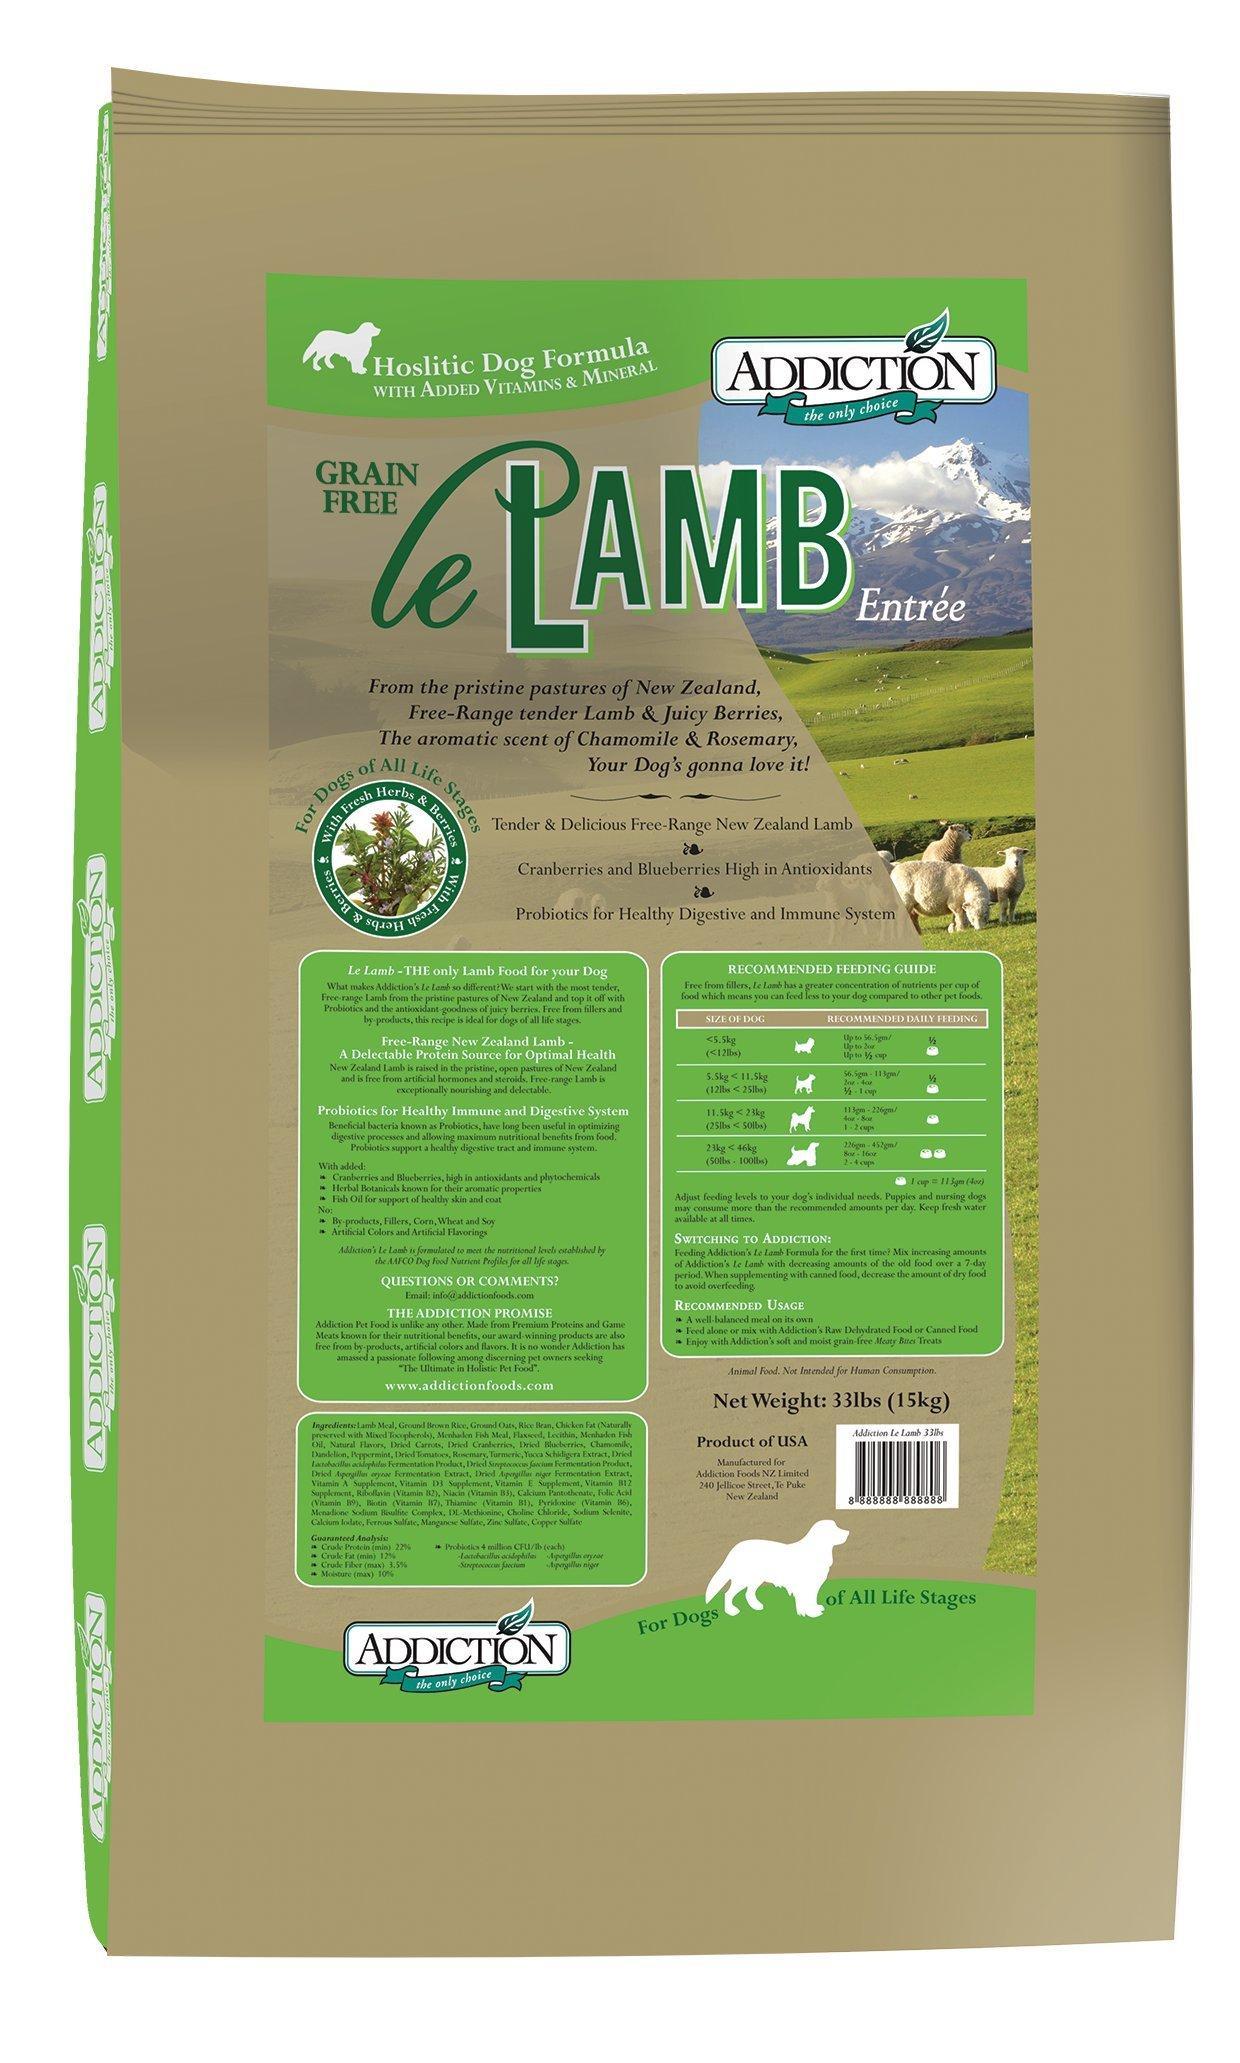 Addiction Le Lamb Grain Free Dry Dog Food, 33 lb.